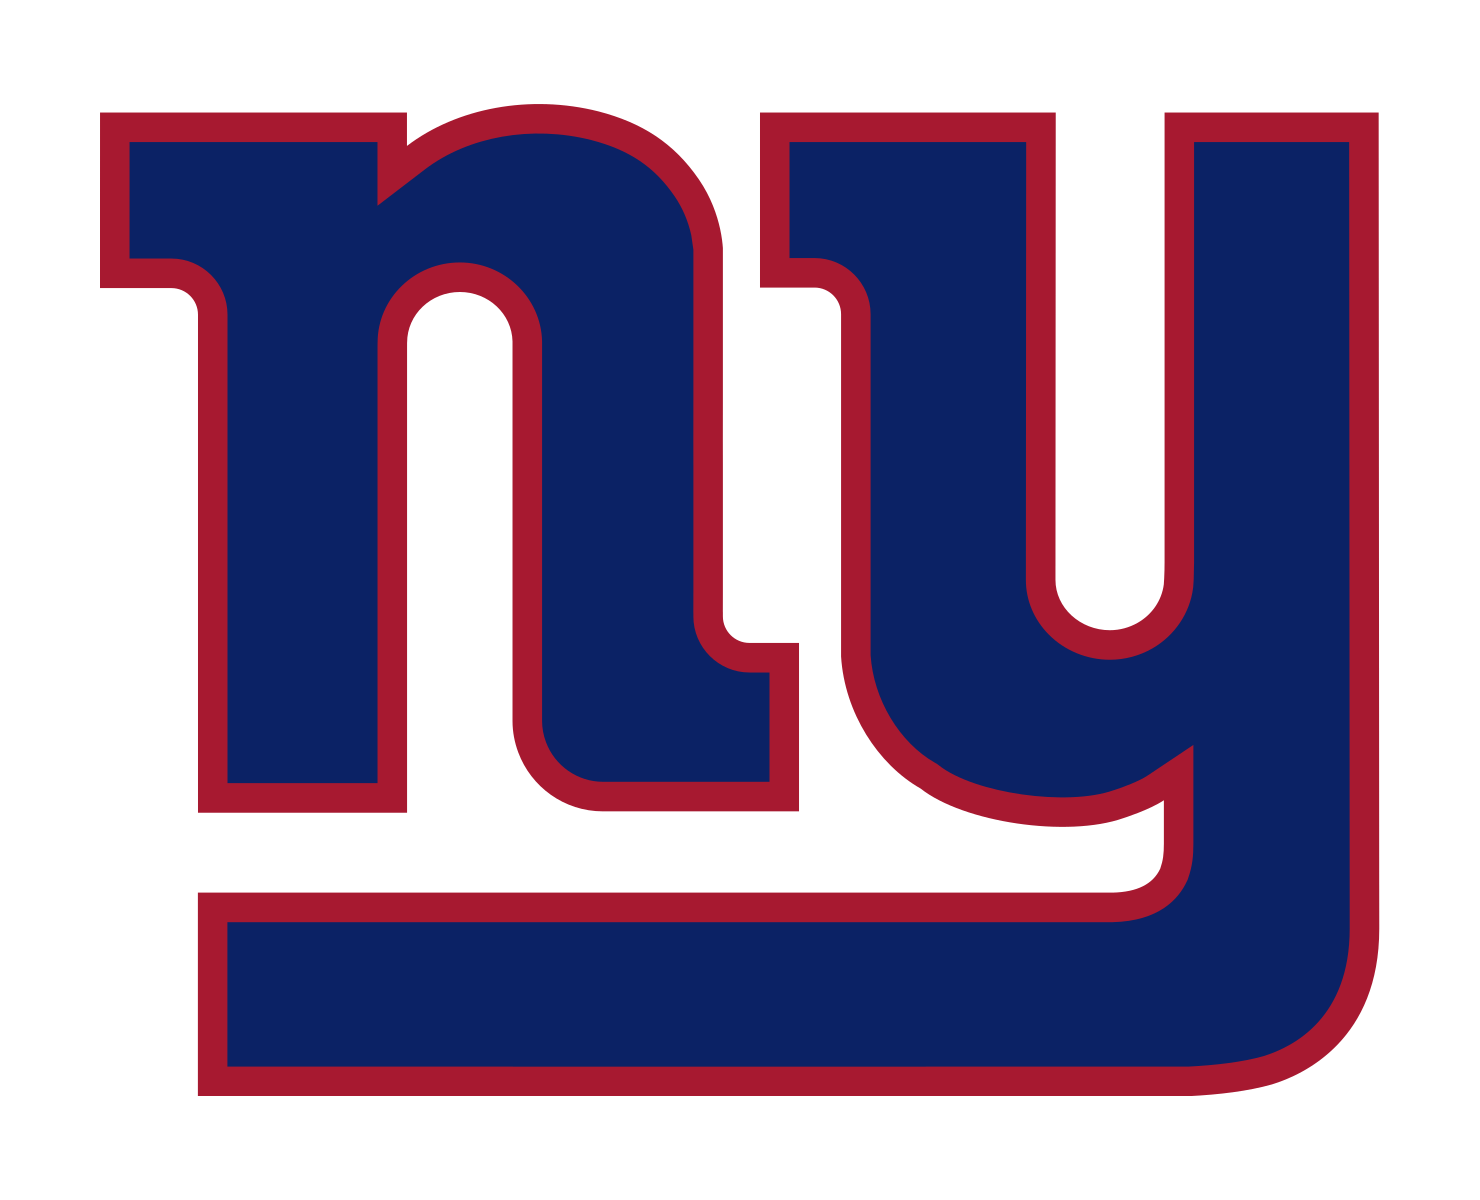 New York Giants Logo New York Giants Logo Nfl New York Giants Nfl Logo